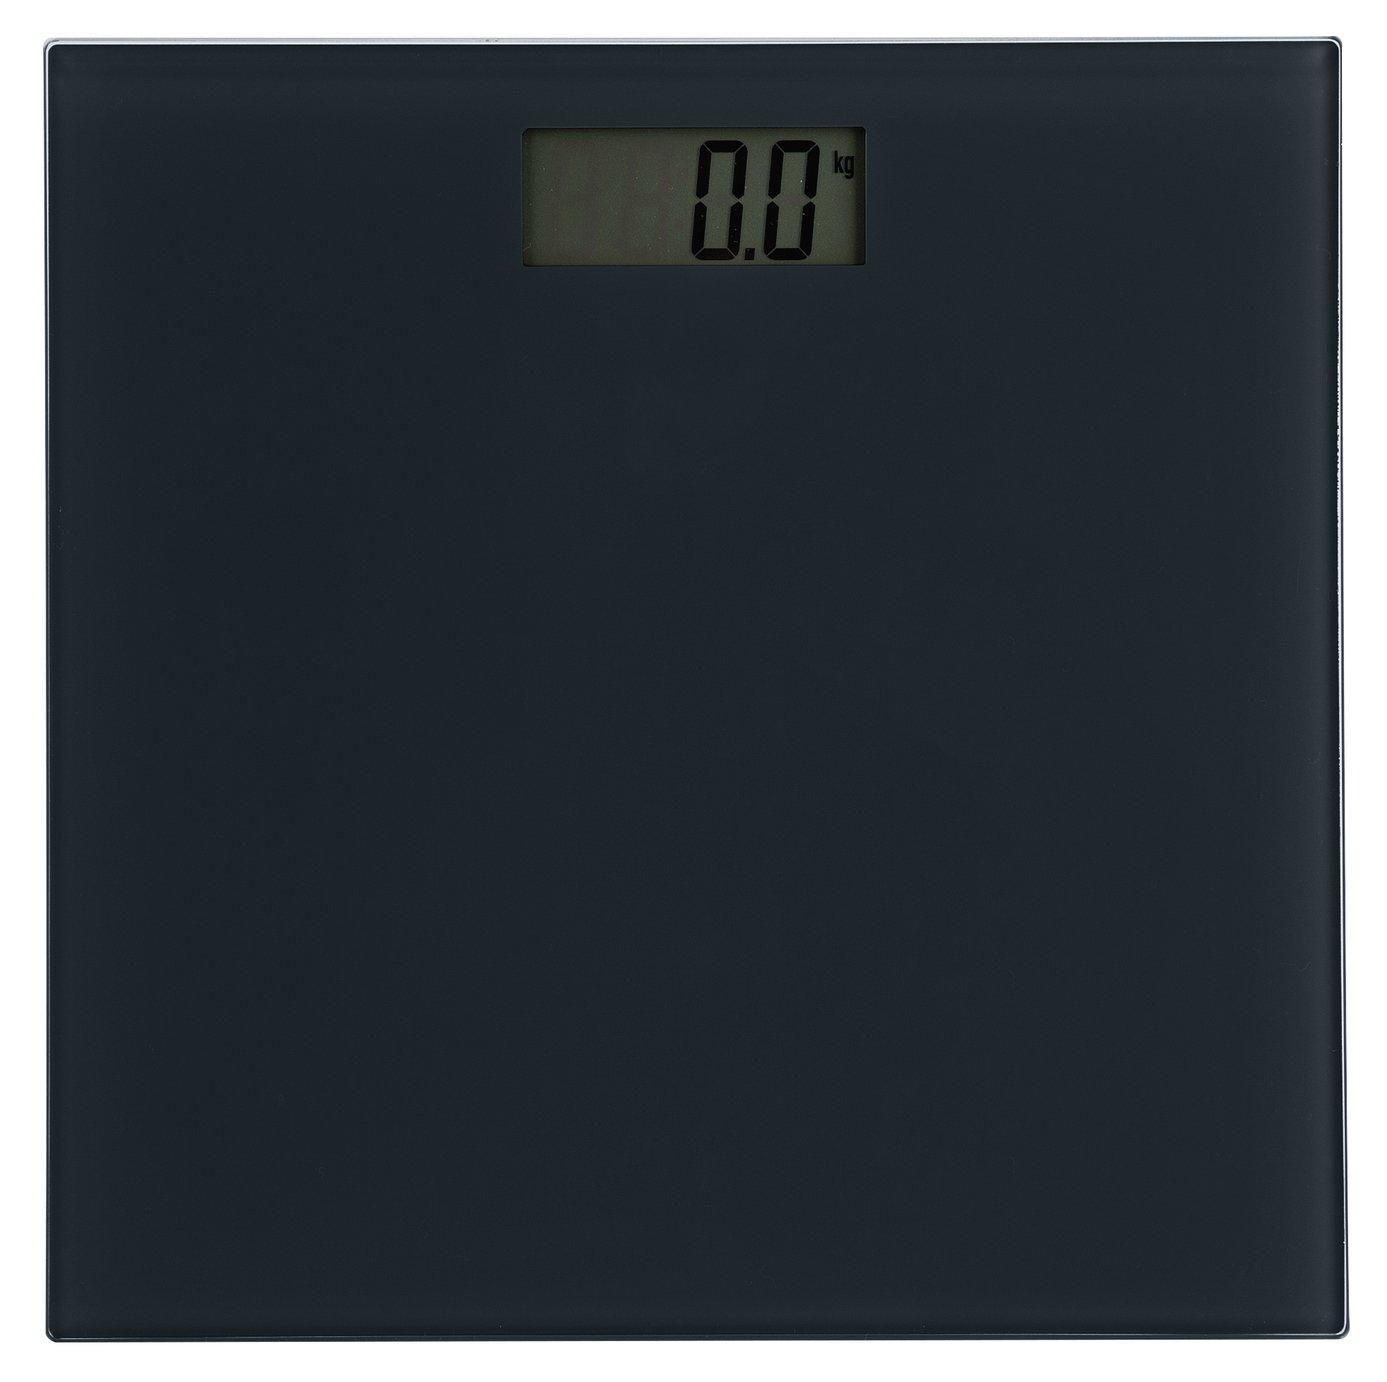 Argos Home Electronic Bathroom Scales - Black